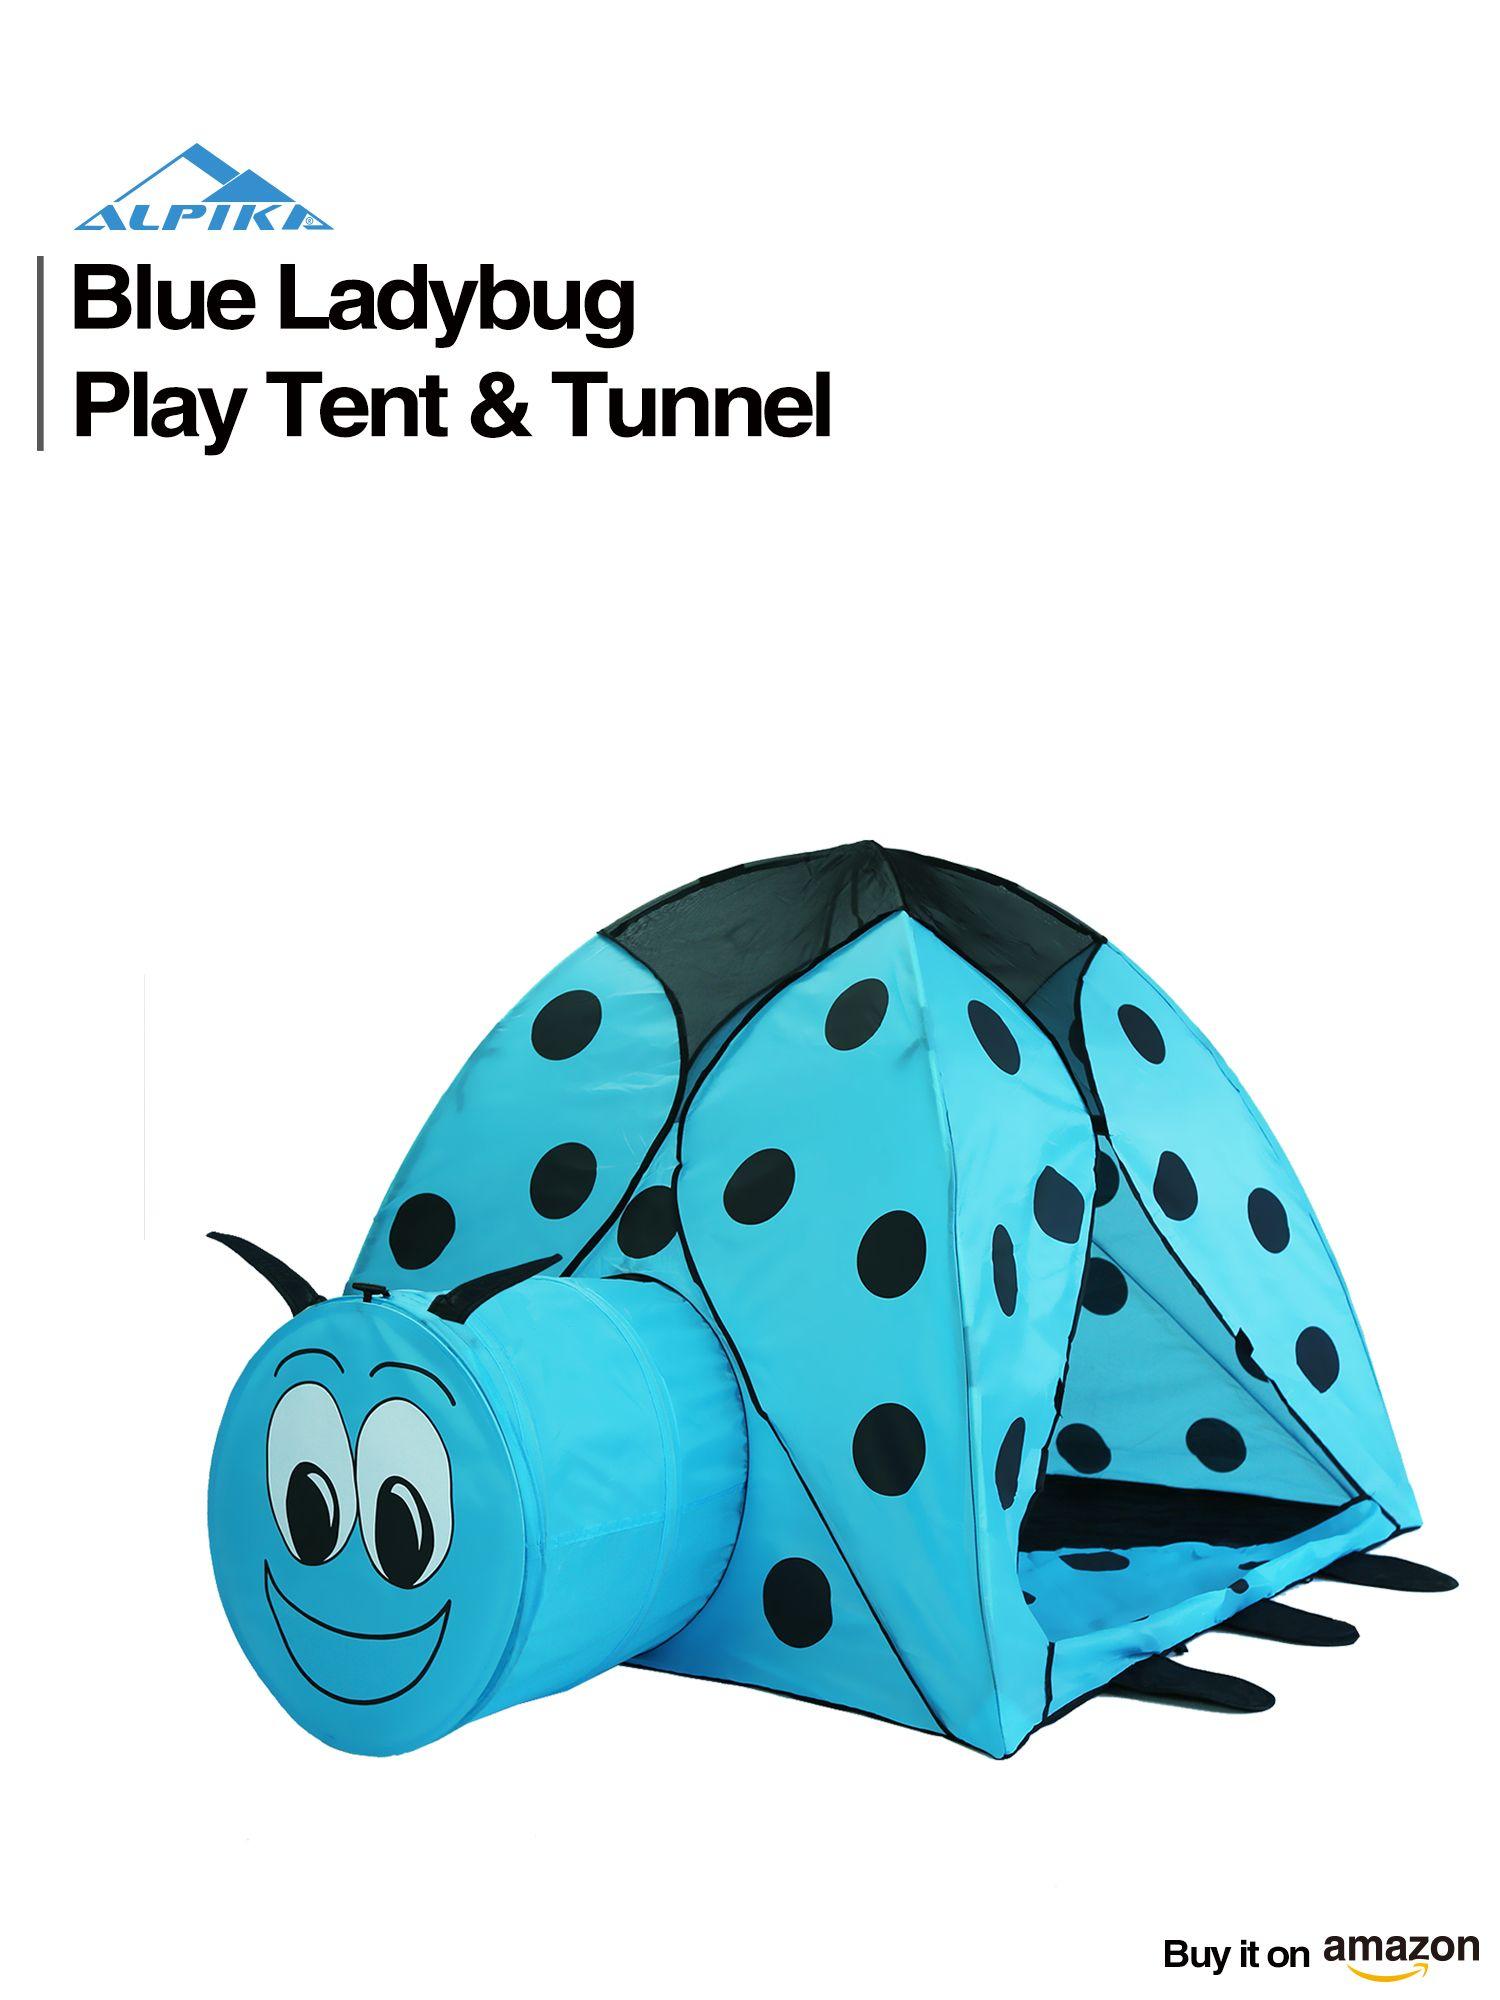 alpika ladybug kids play tent and ball pit with storage bag blue